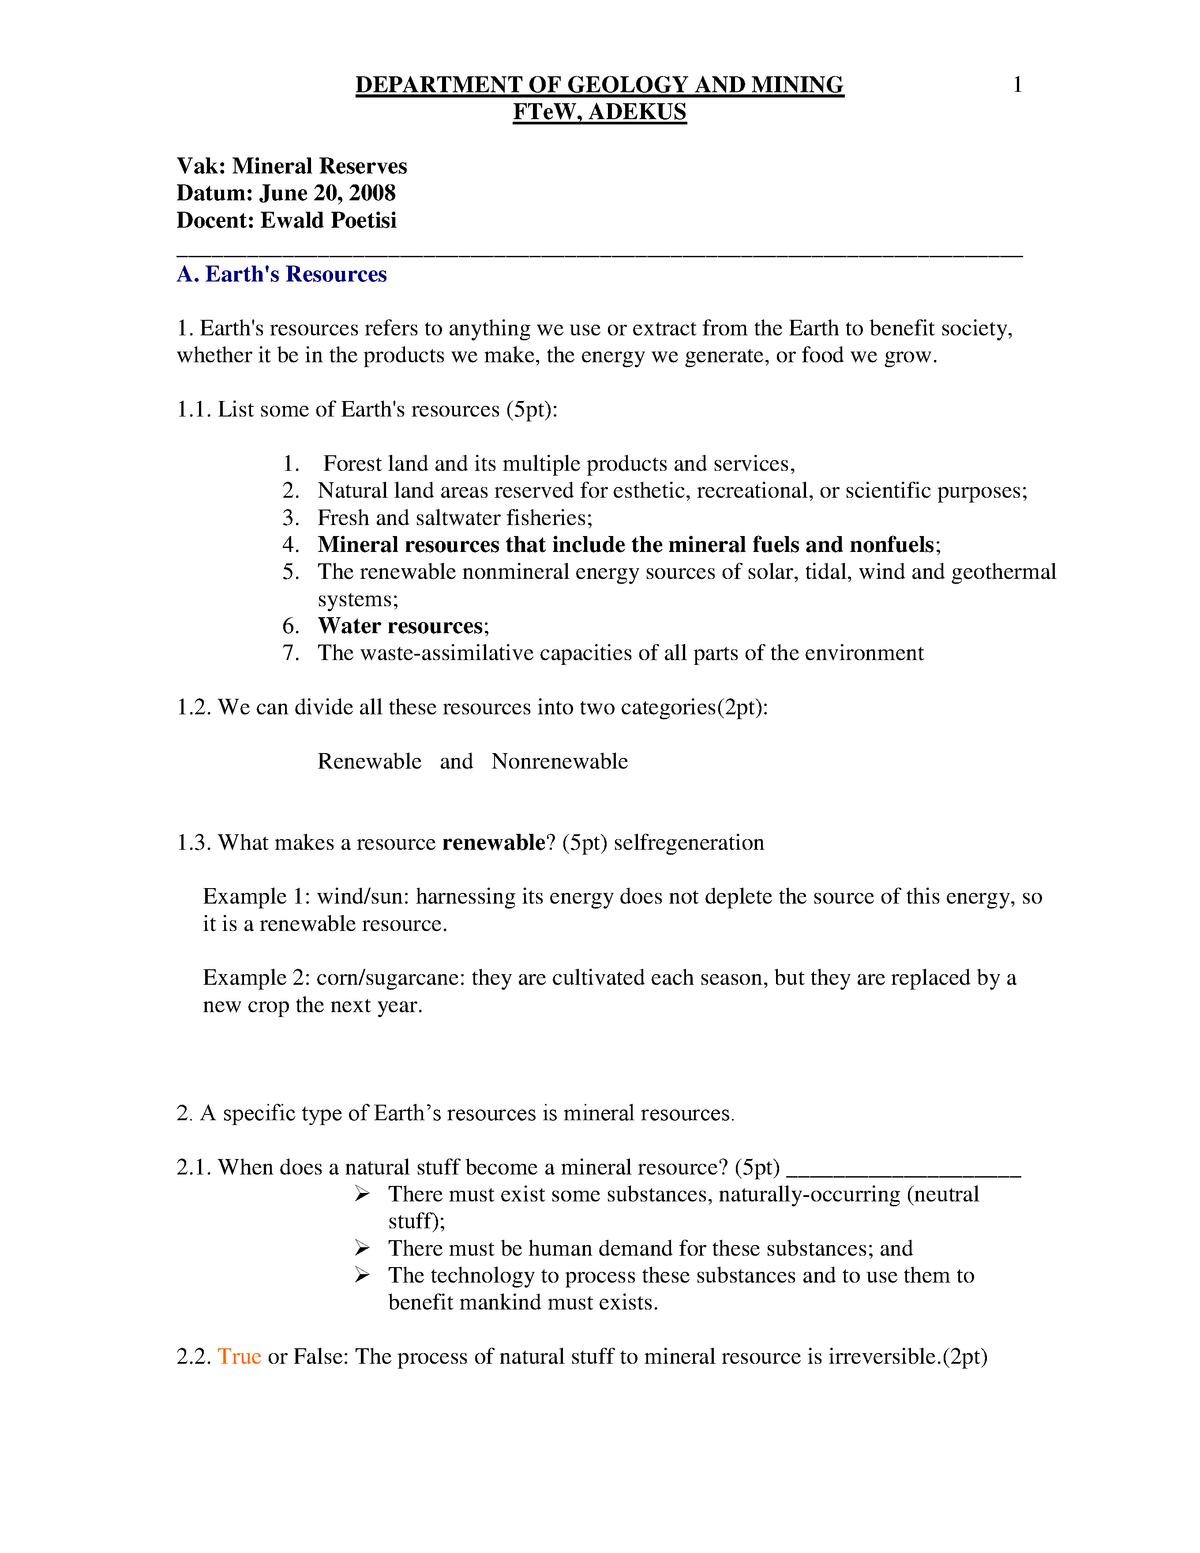 Exam 2008 - DP409: Mineraal reserves - StuDocu